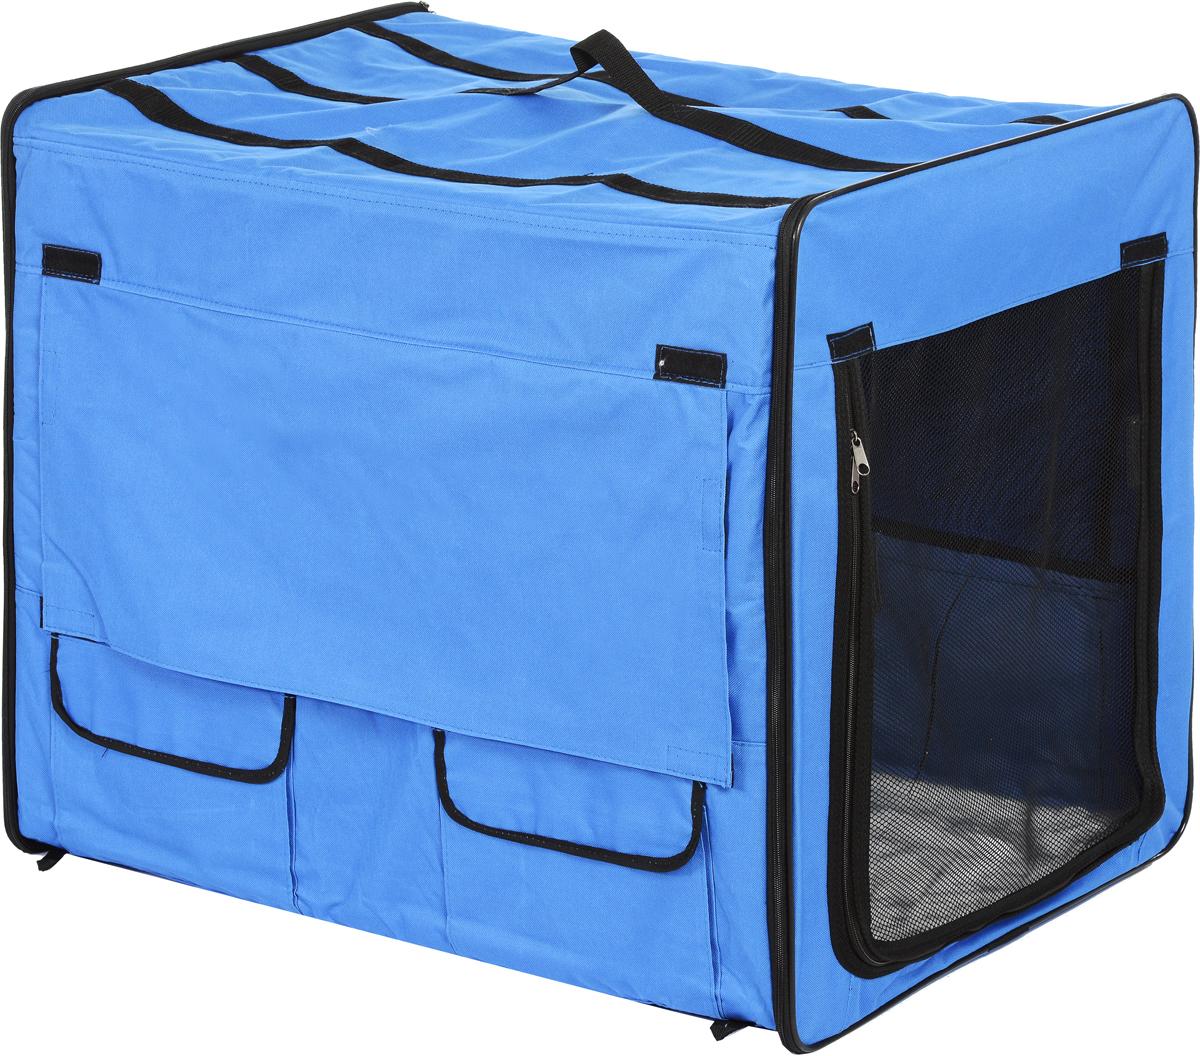 "Клетка для животных ""Заря-Плюс"", выставочная, цвет: голубой, черный, 75 х 60 х 50 см КТС2г"